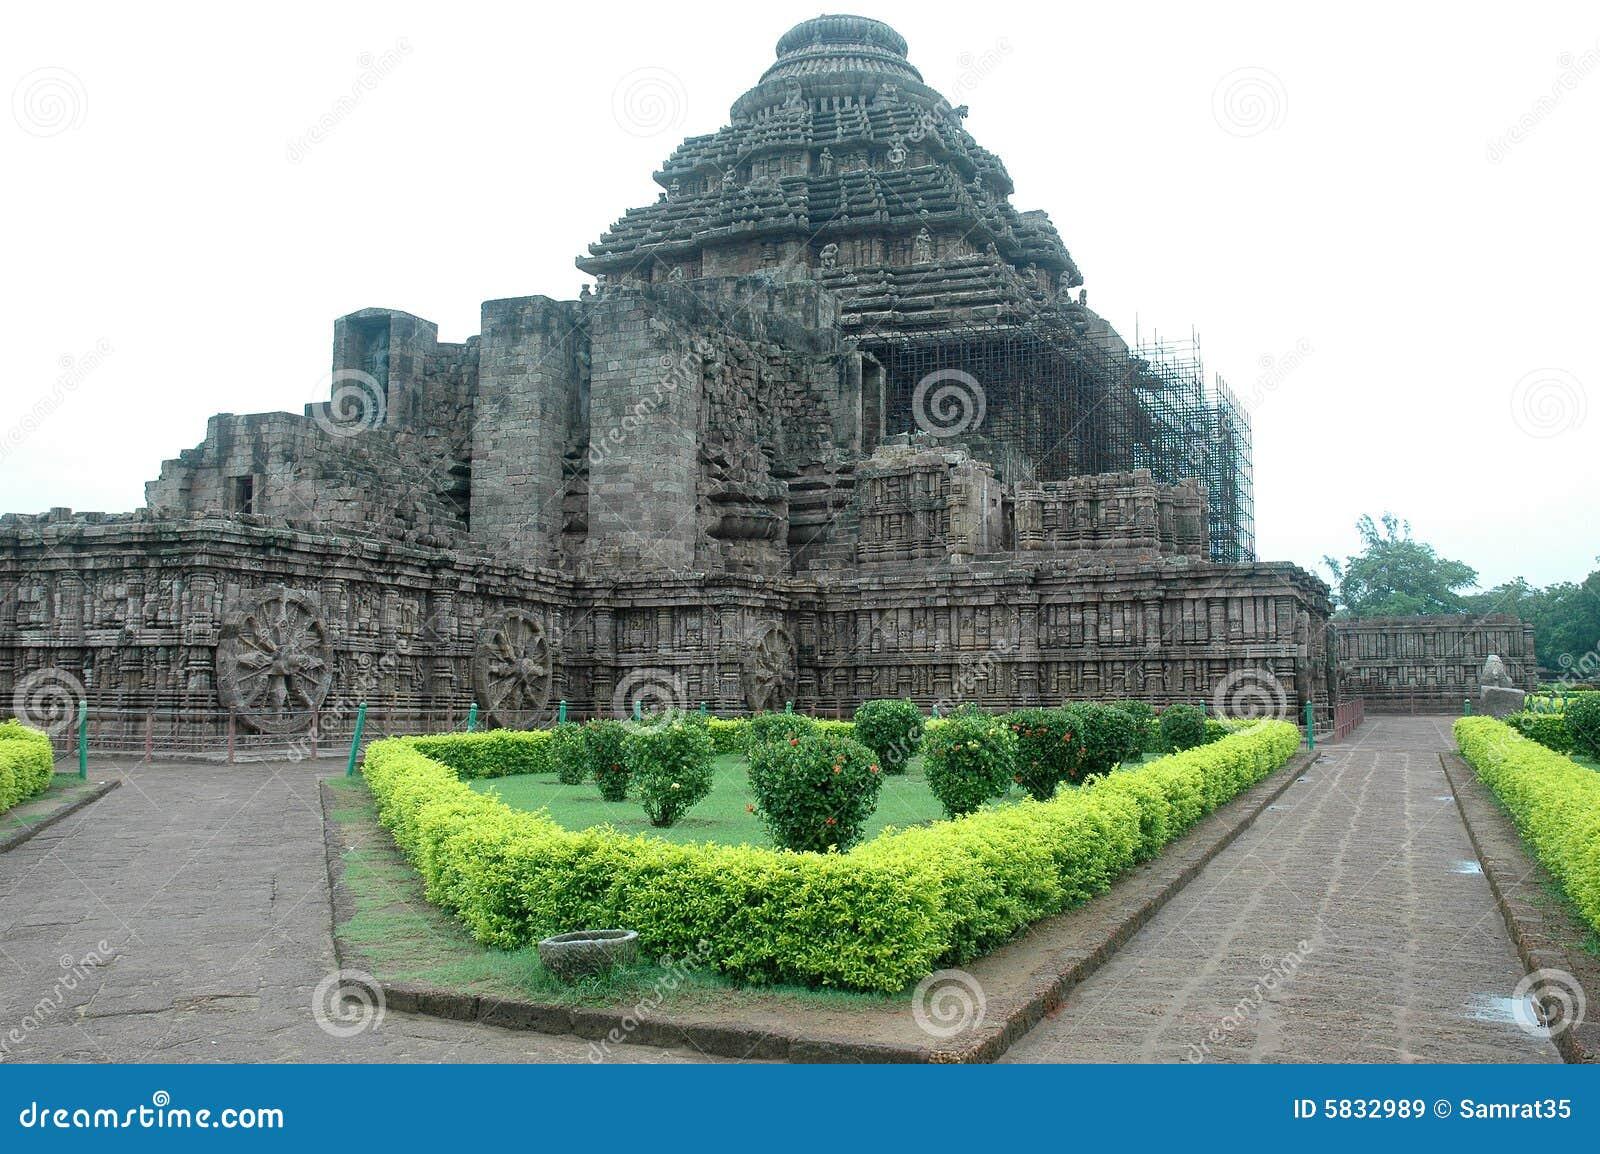 Konark Temple Of Orissa-India. Stock Photo - Image: 5832920